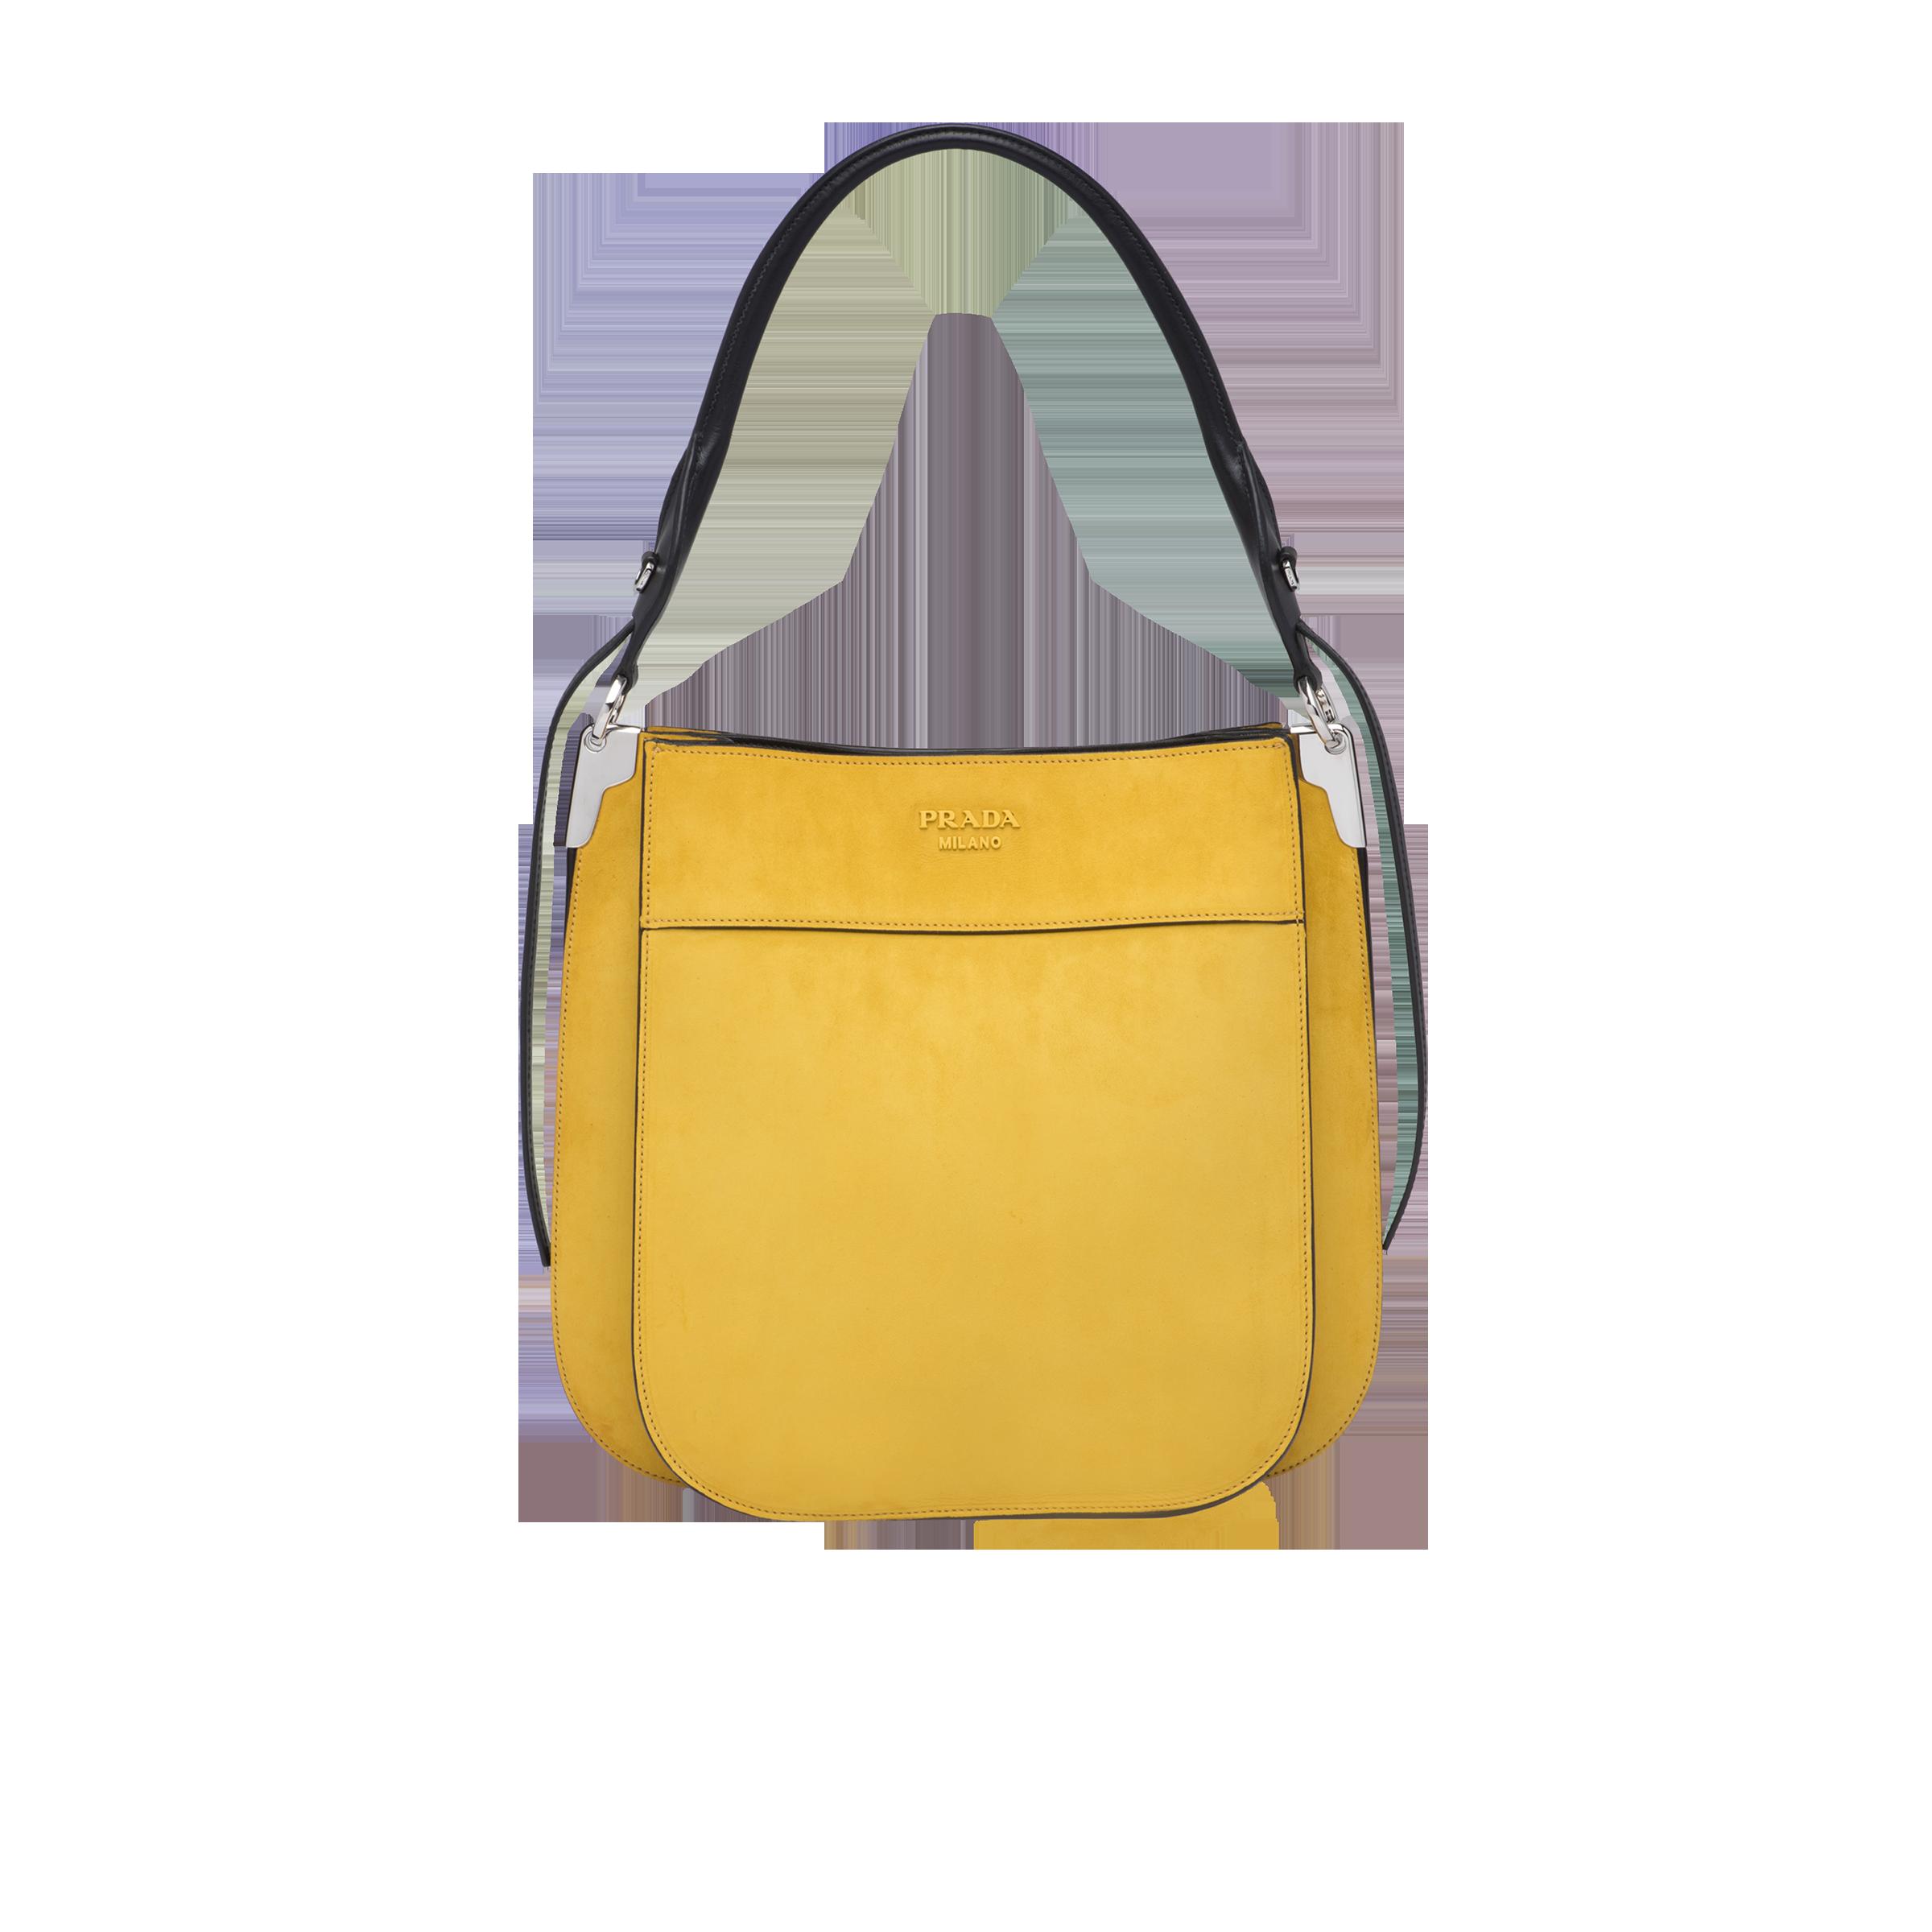 9368f5519f63 Women's Bags | Prada